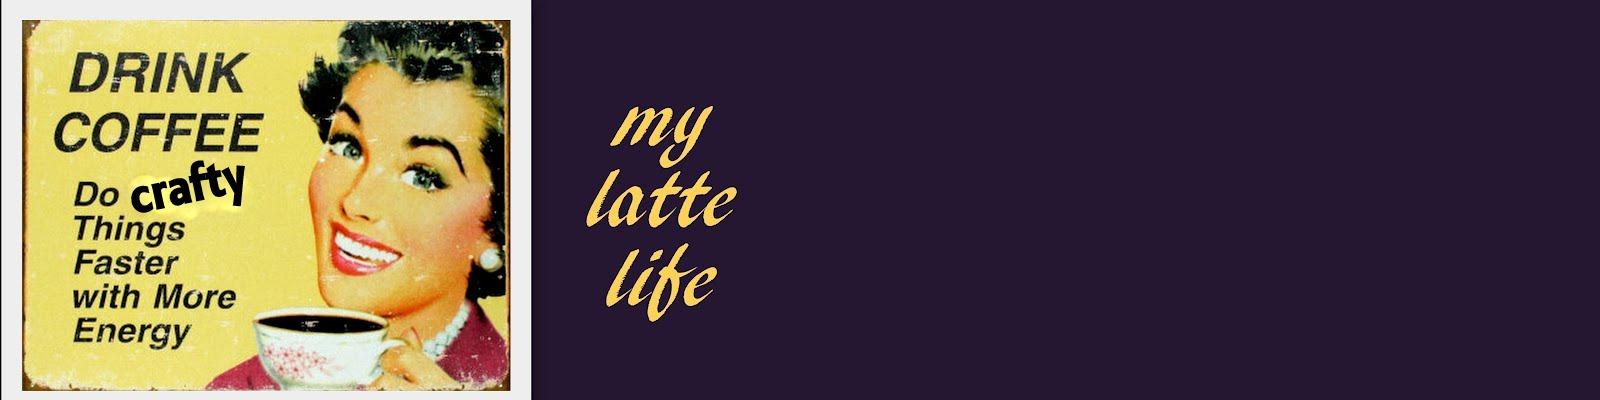 new latte life